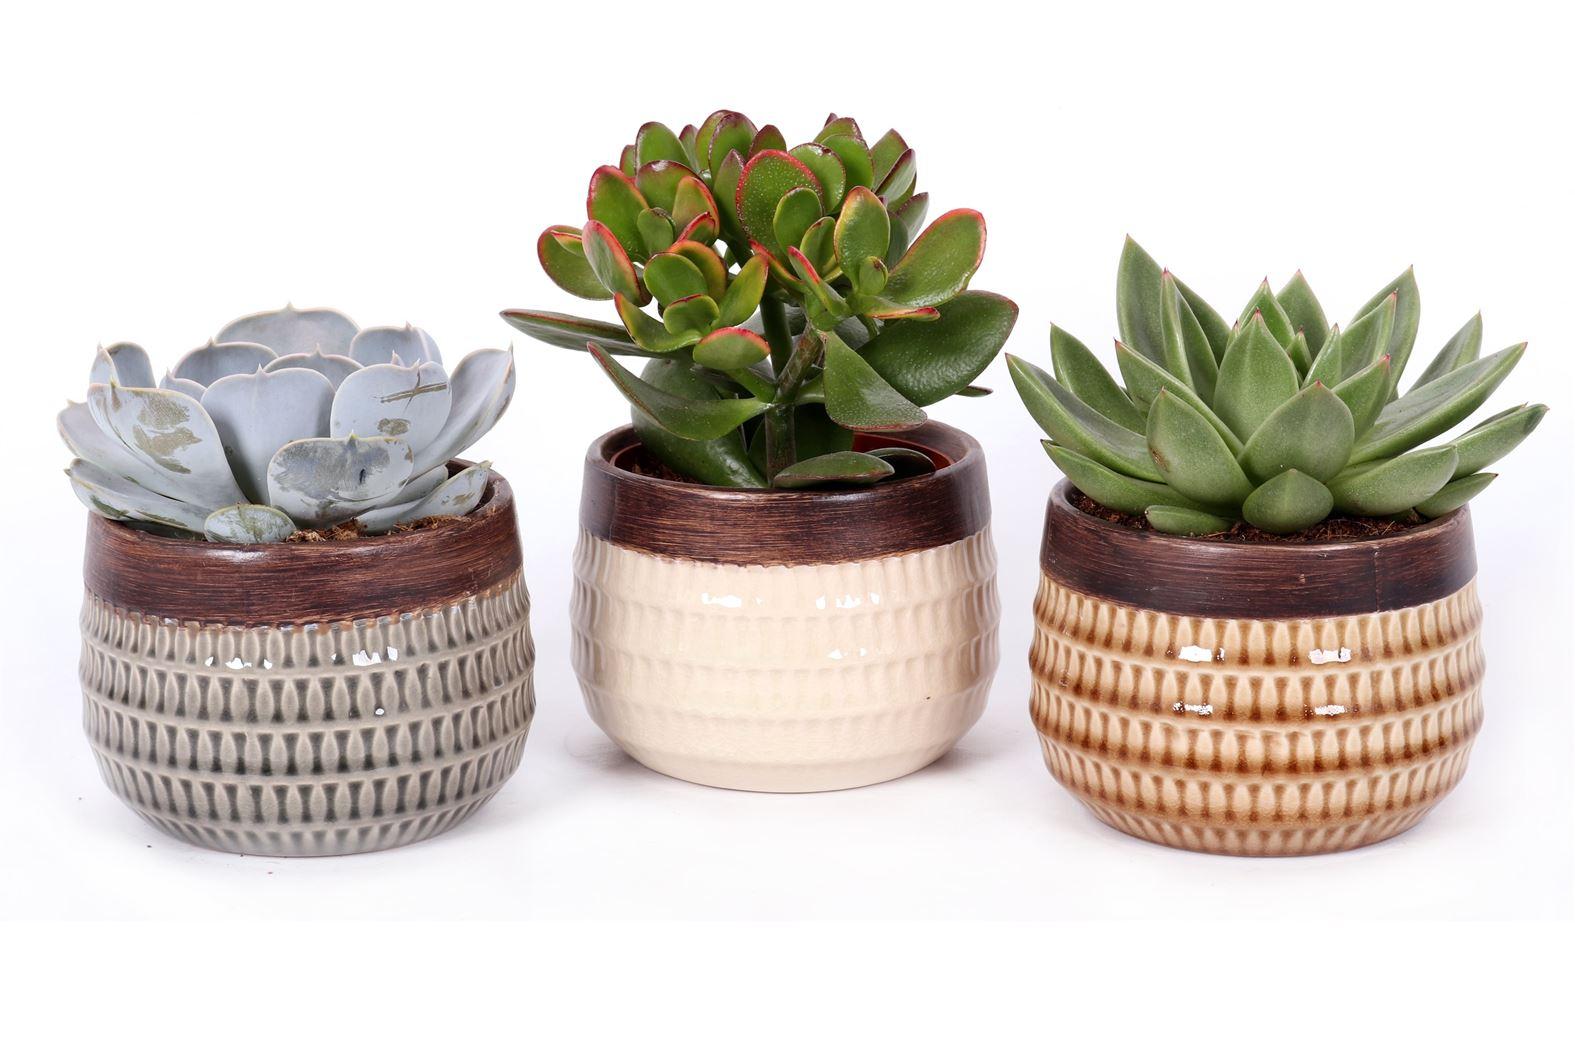 succulenten gemengd in cairo keramiek